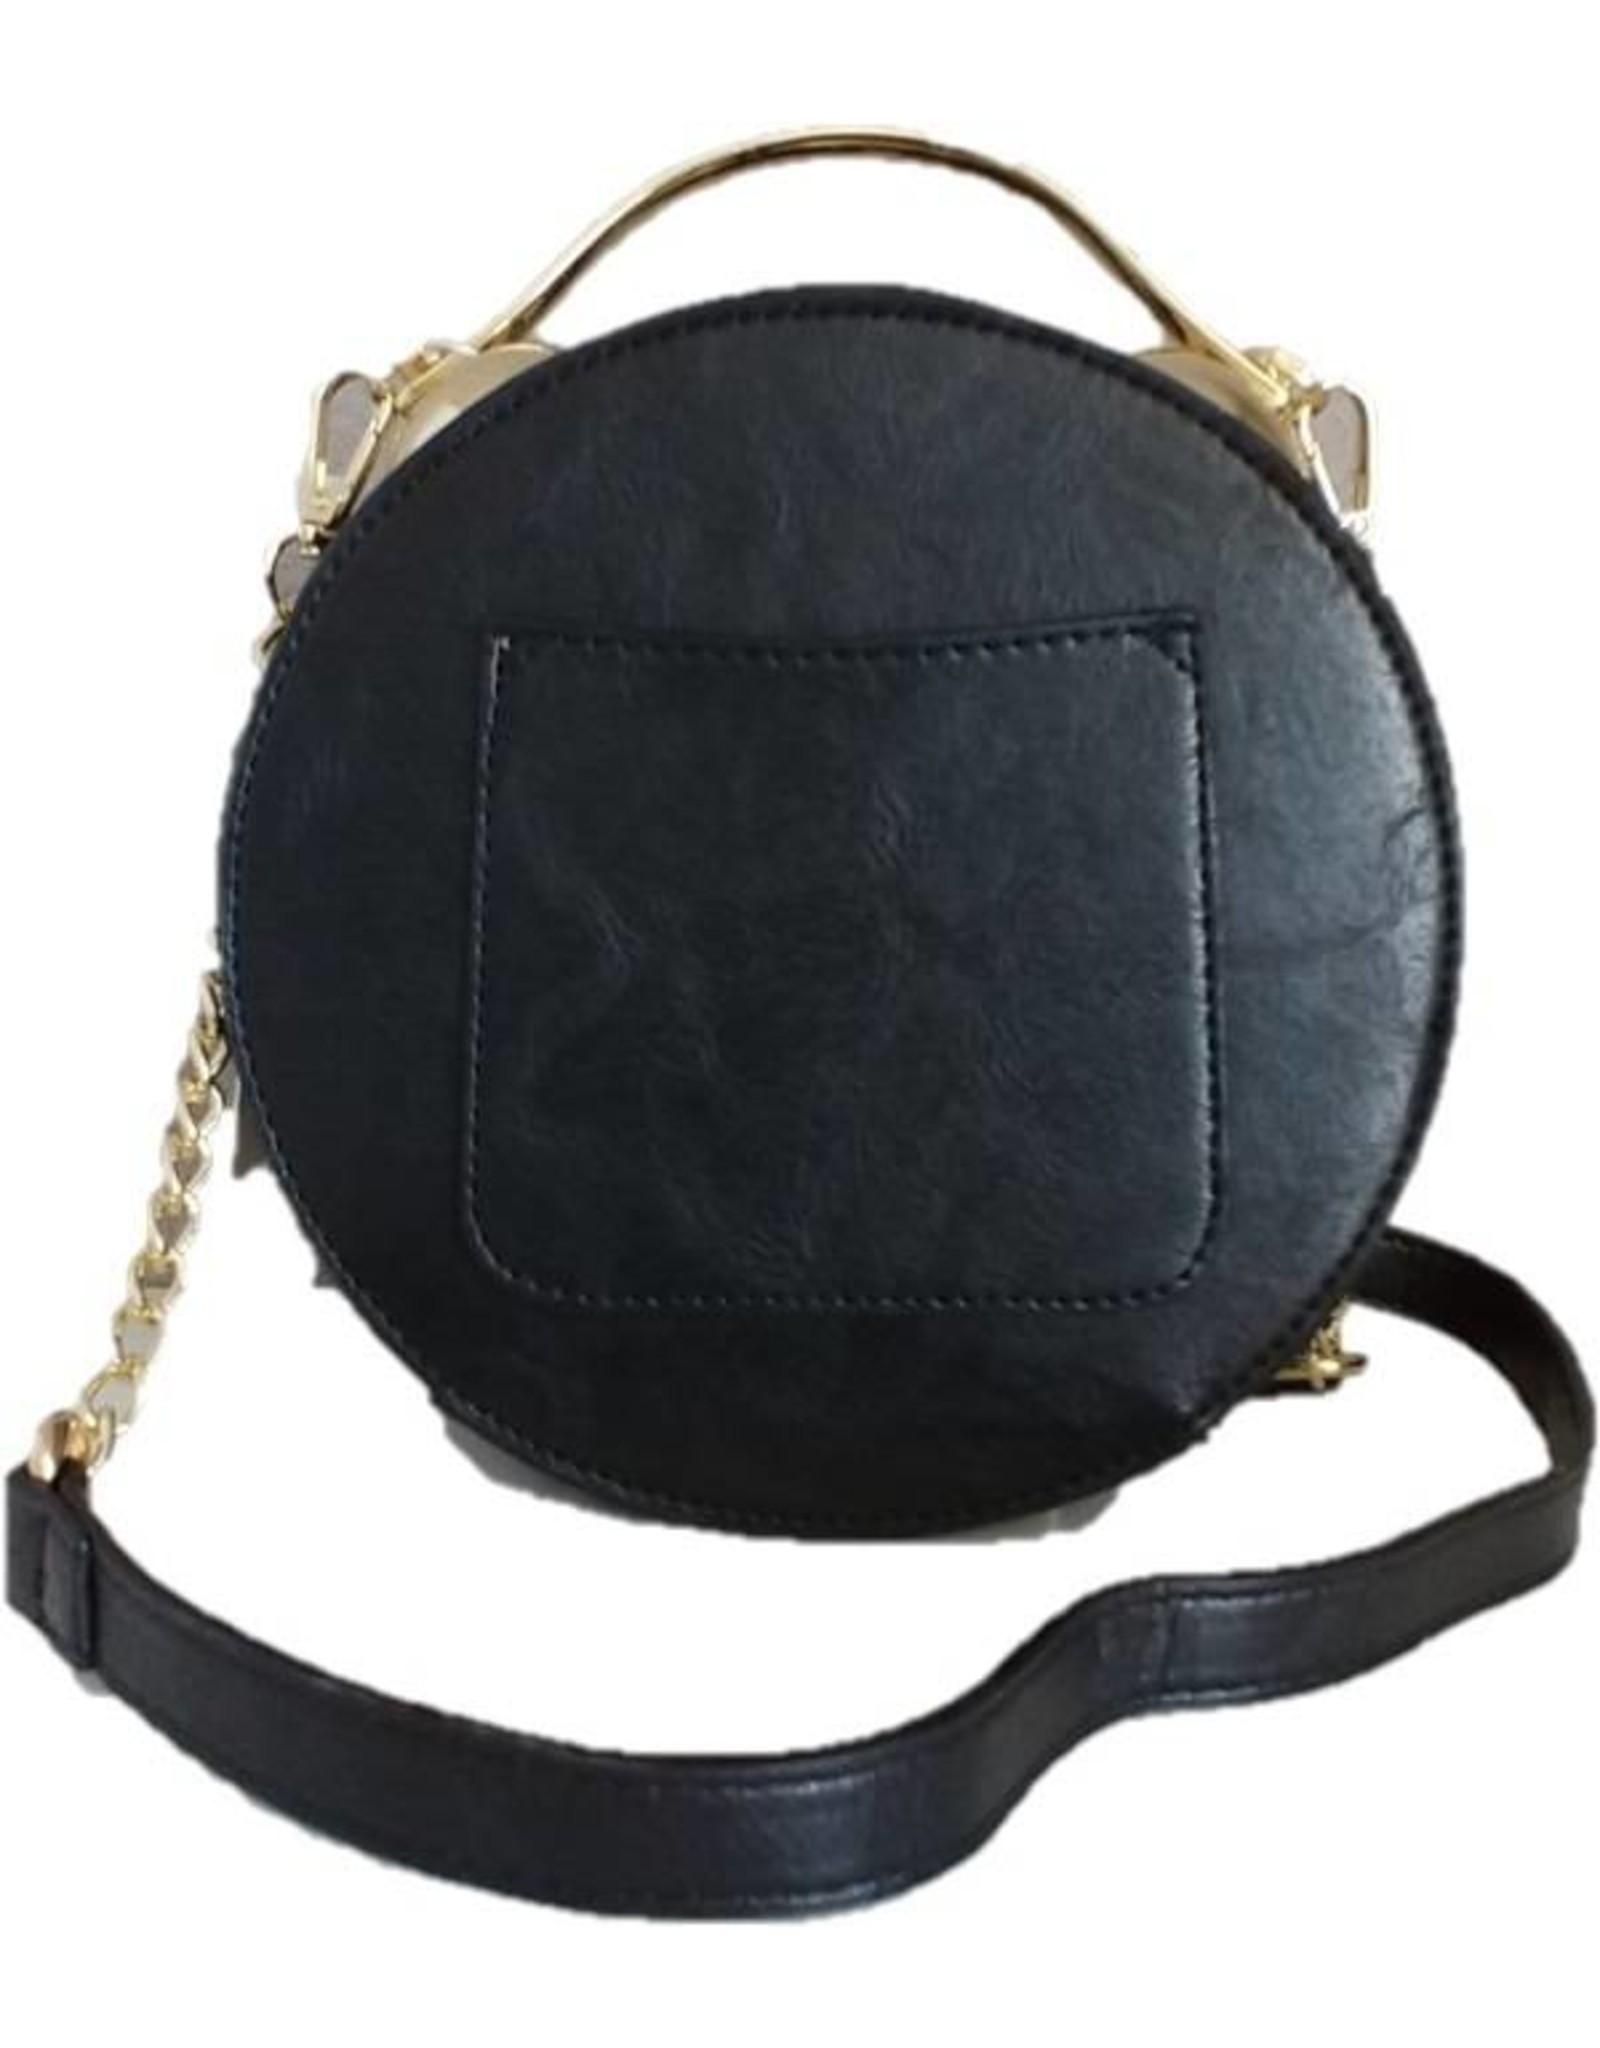 Trukado Fantasy bags - Fantasy shoulder bag with working clock black